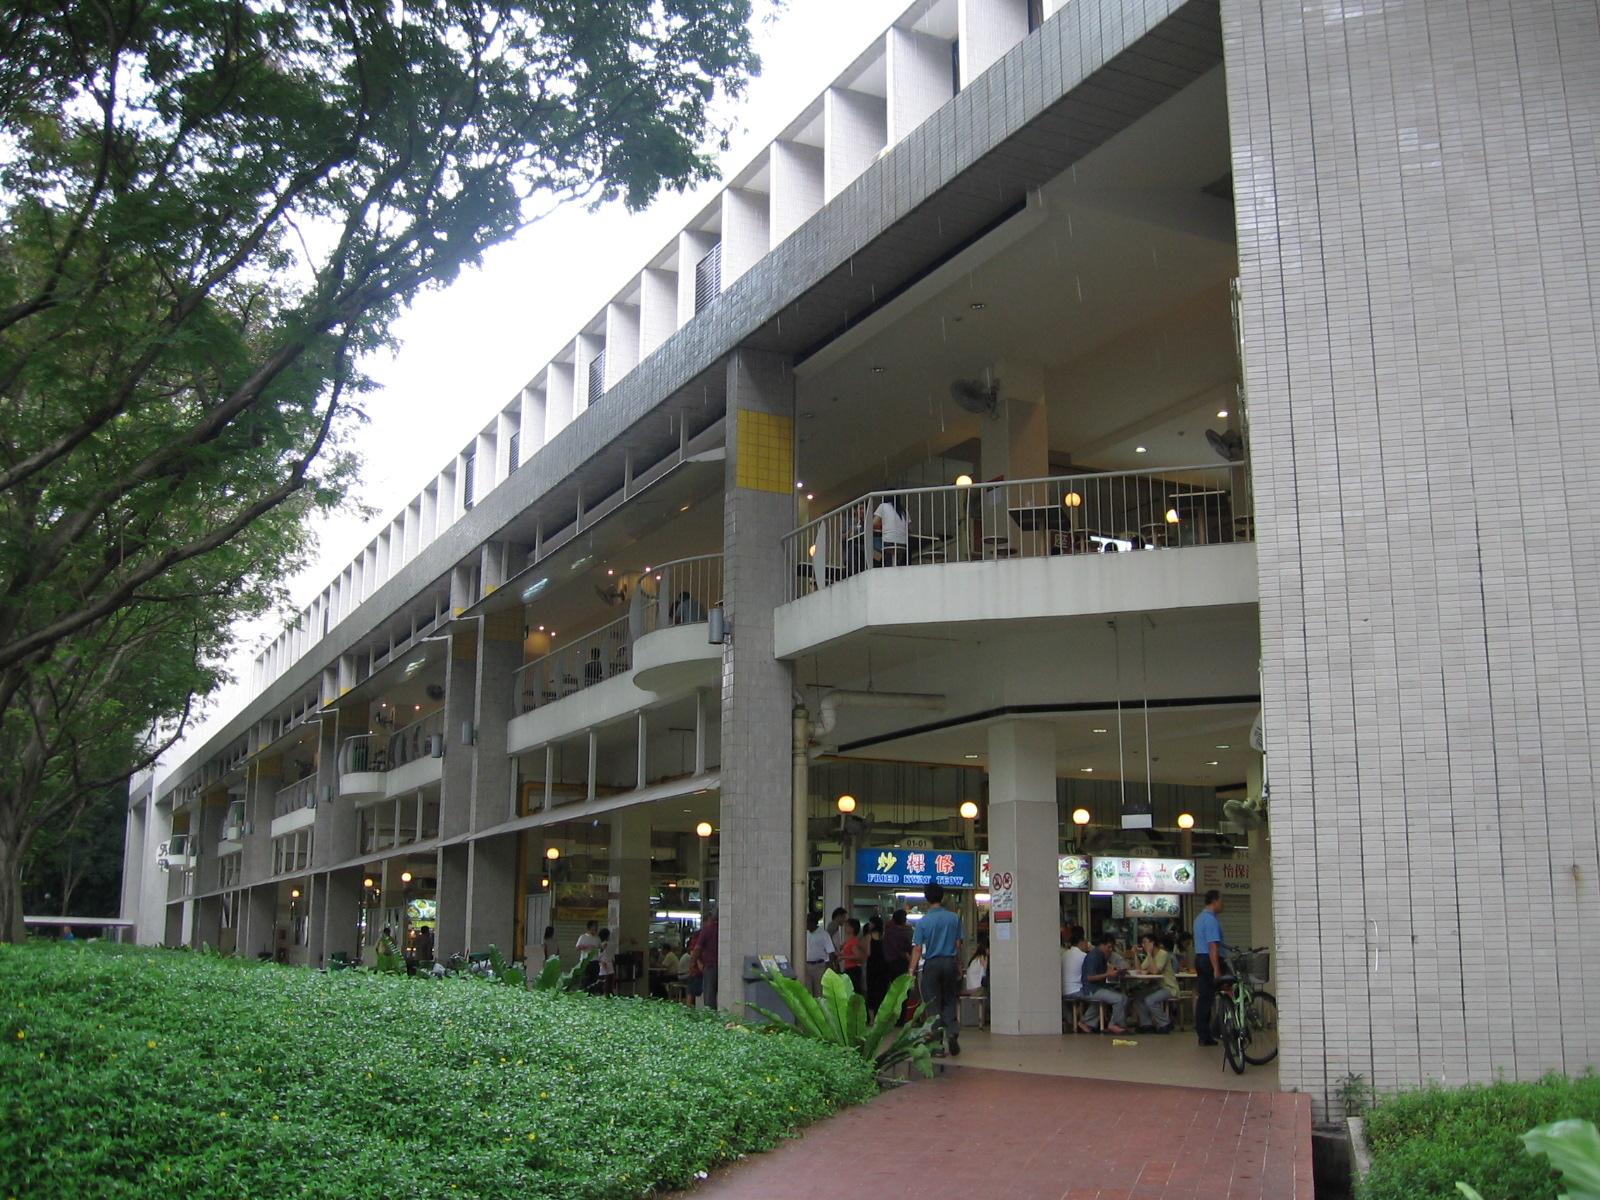 Amoy Street Food Centre Mrt